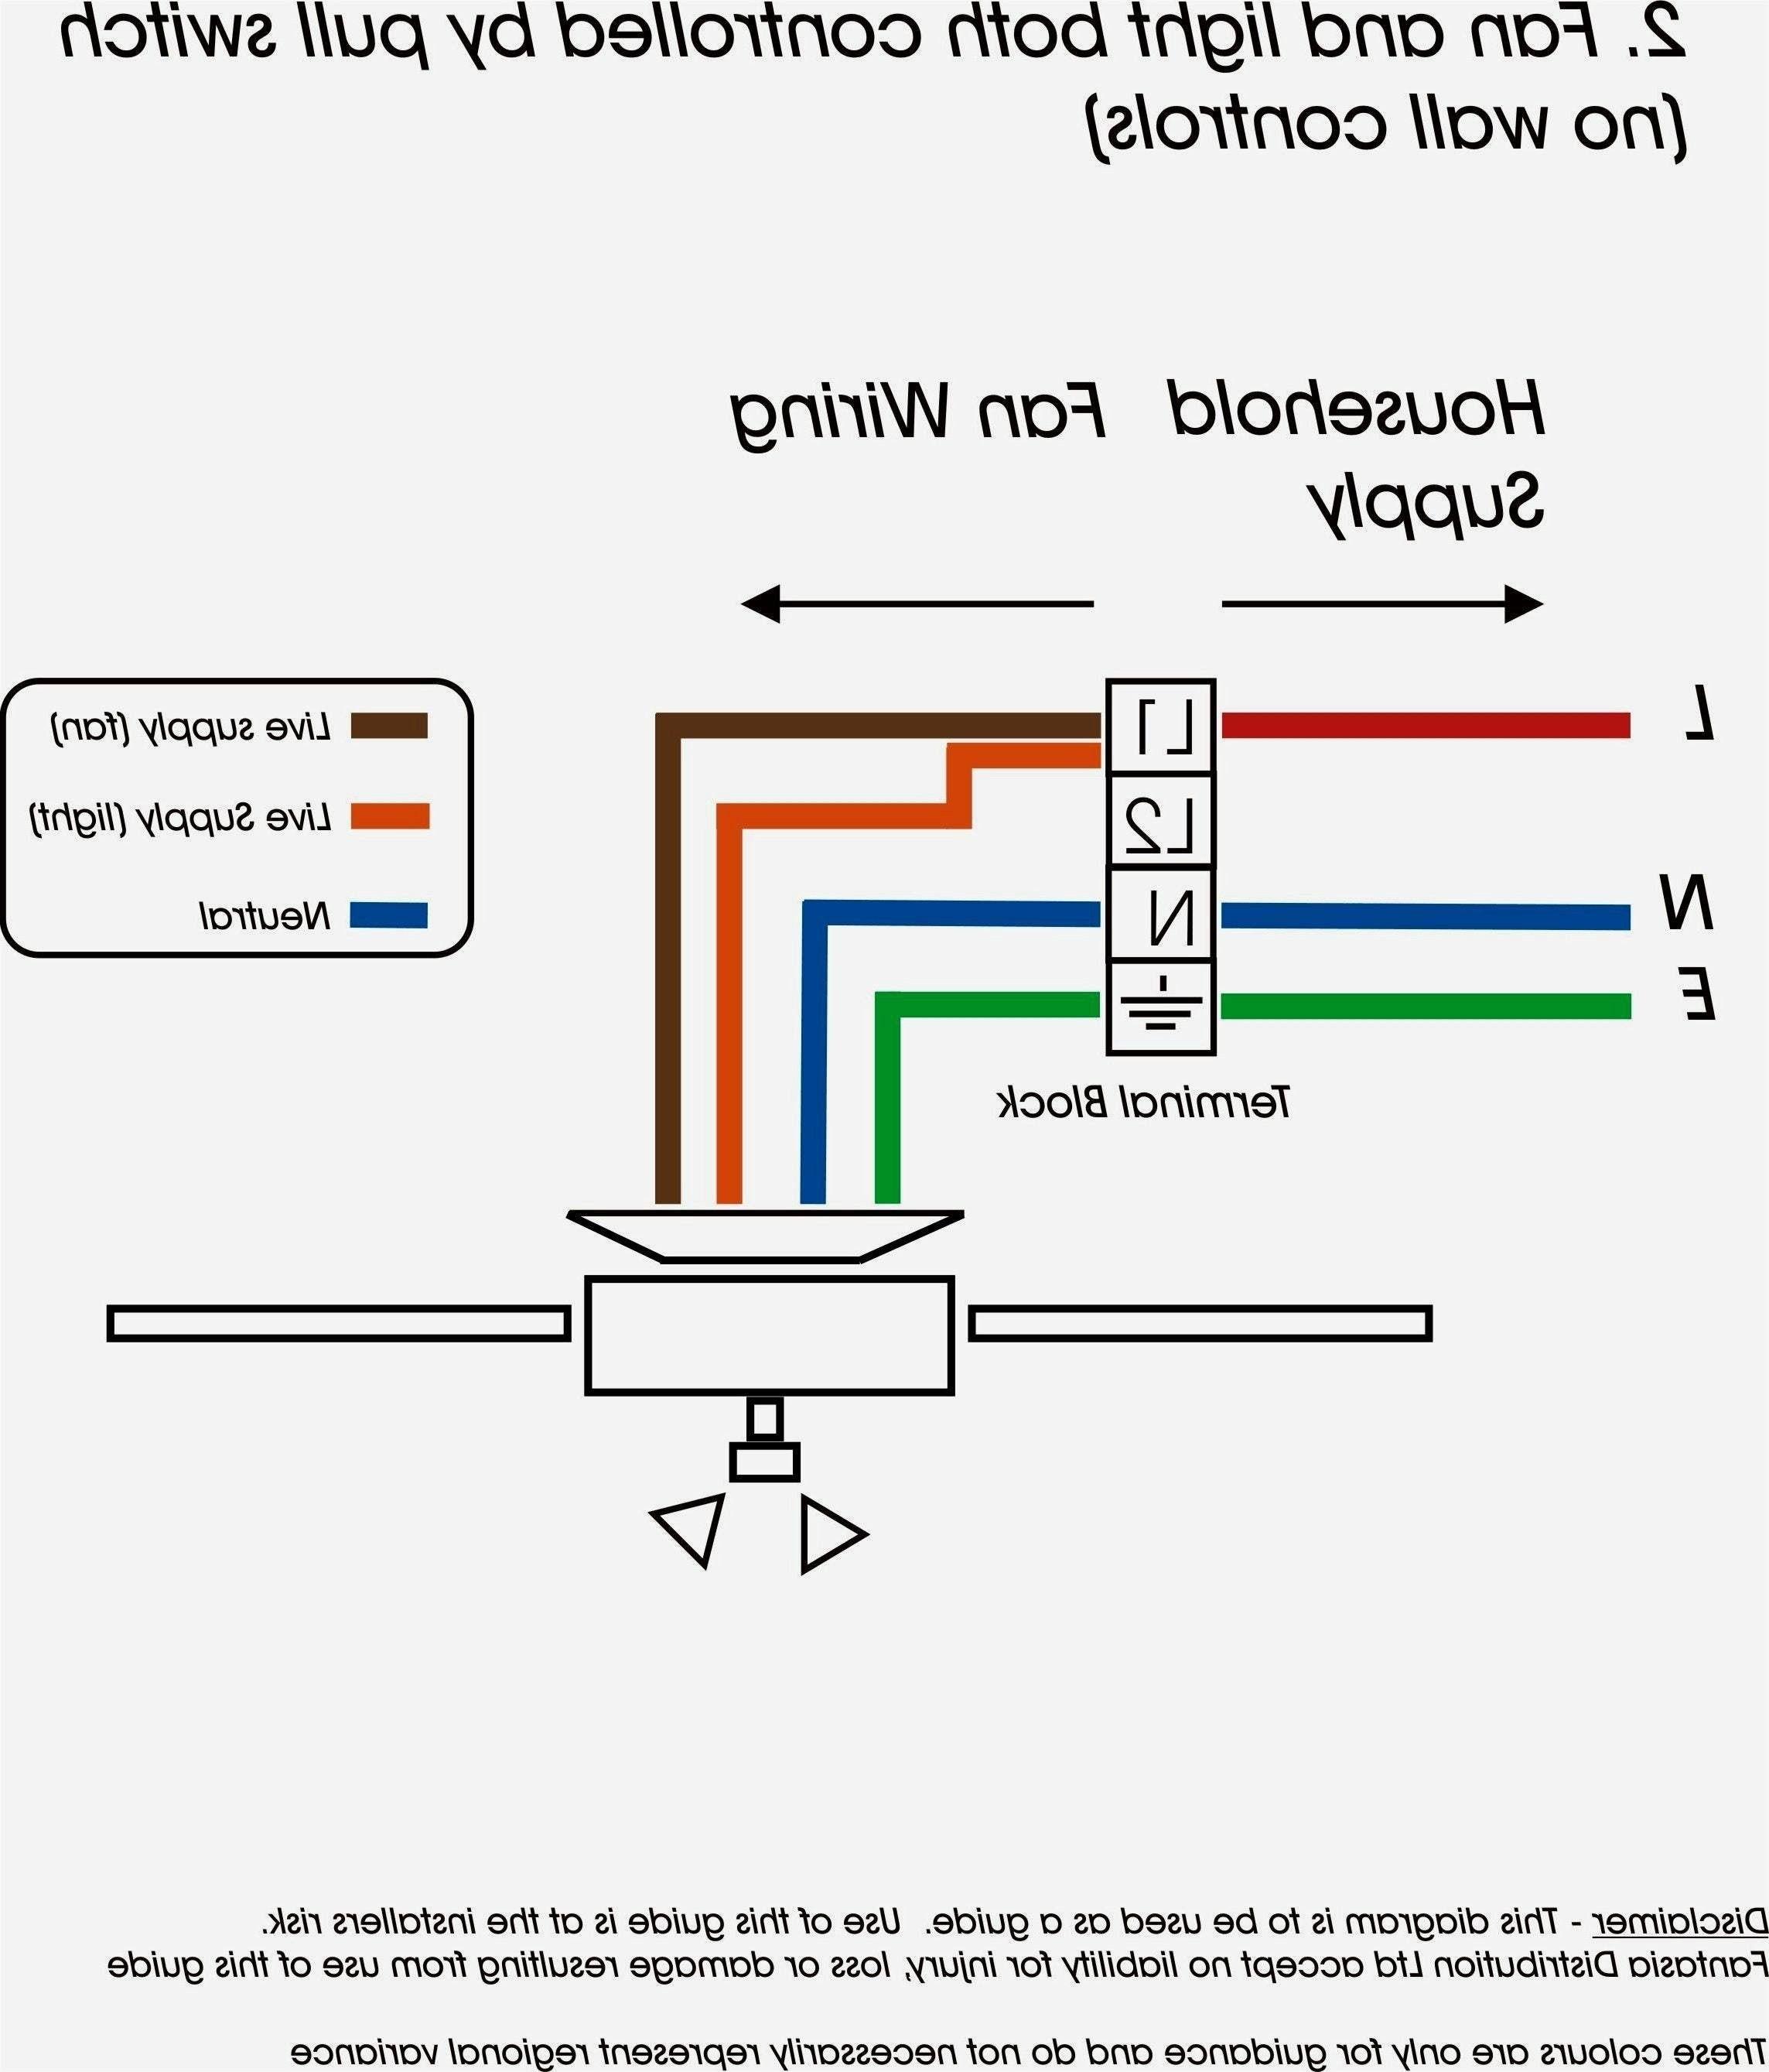 Unique Wiring Diagram For A Leviton Dimmer Switch Diagram Diagramtemplate Diagramsample Caravana De Lagrima Motor Dc Esquemas Electronicos